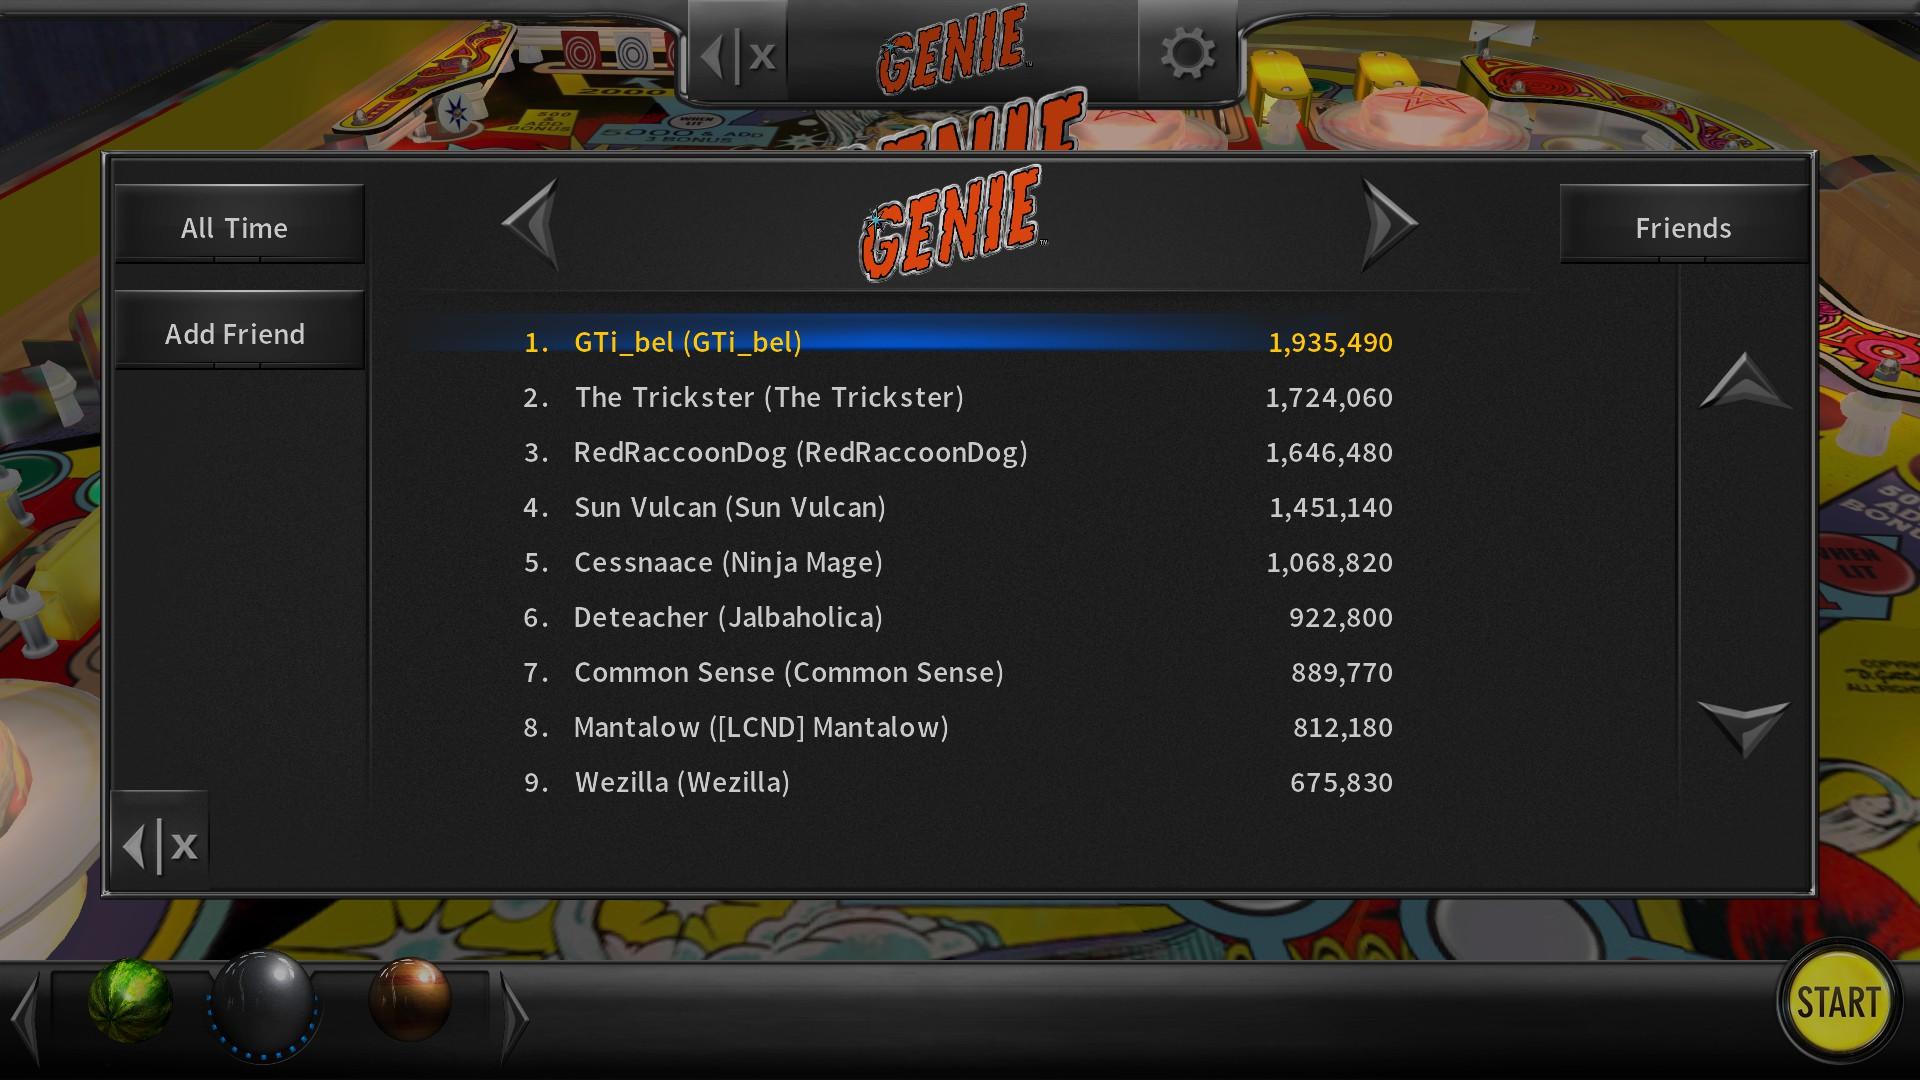 GTibel: Pinball Arcade: Genie (PC) 1,935,490 points on 2018-07-26 10:09:36